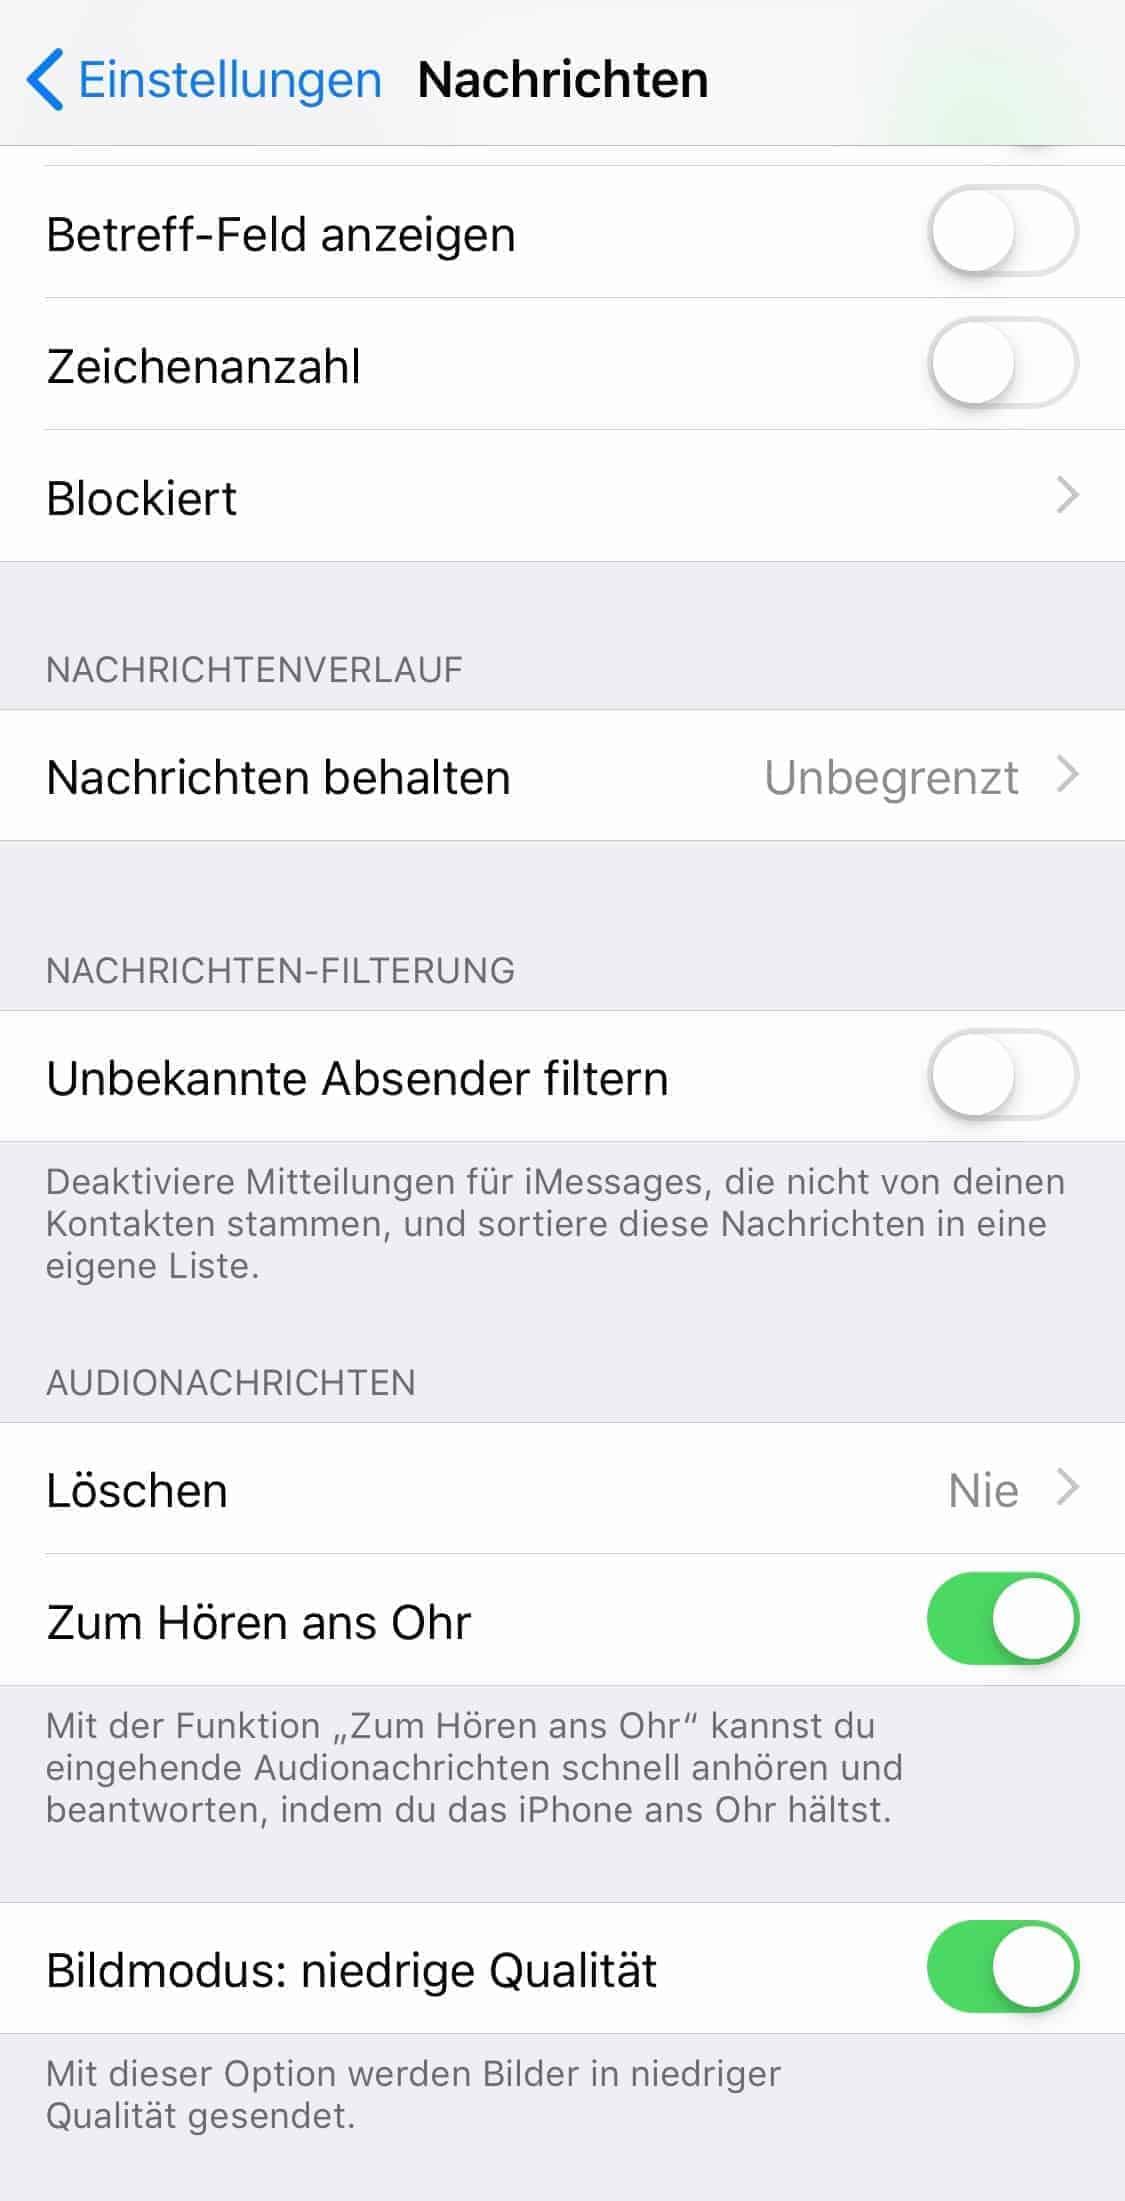 Roaming_iOS_Nachrichten_Bildmodus